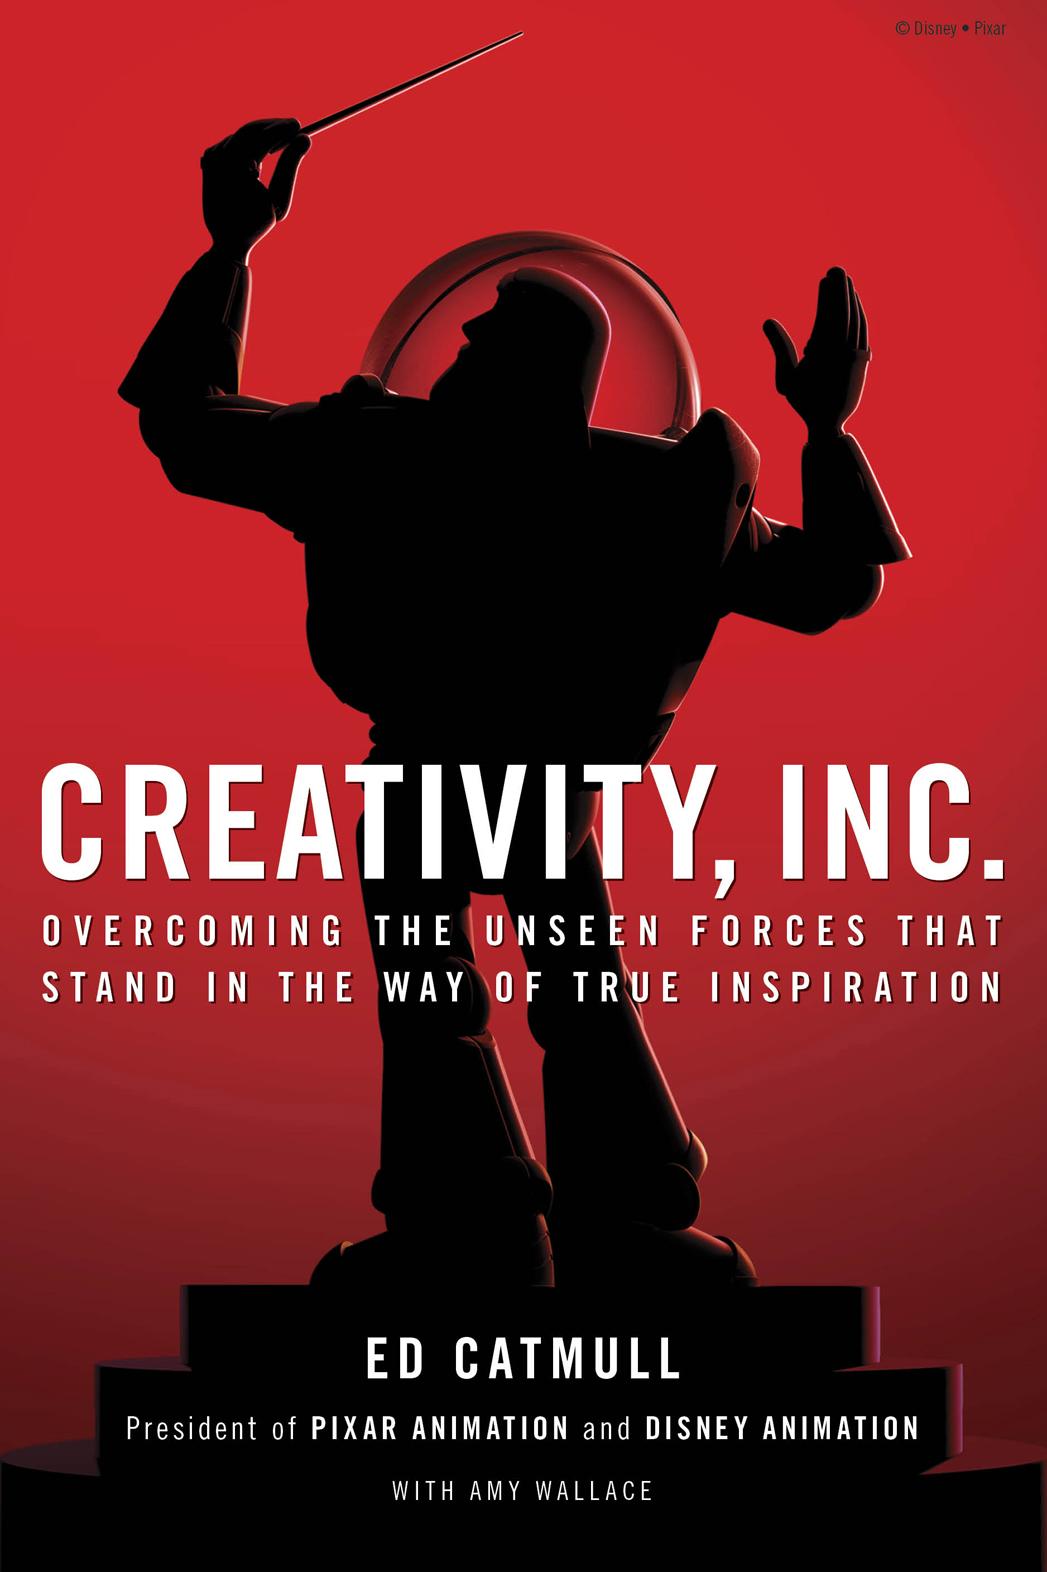 Creativity Inc. Cover - P 2013